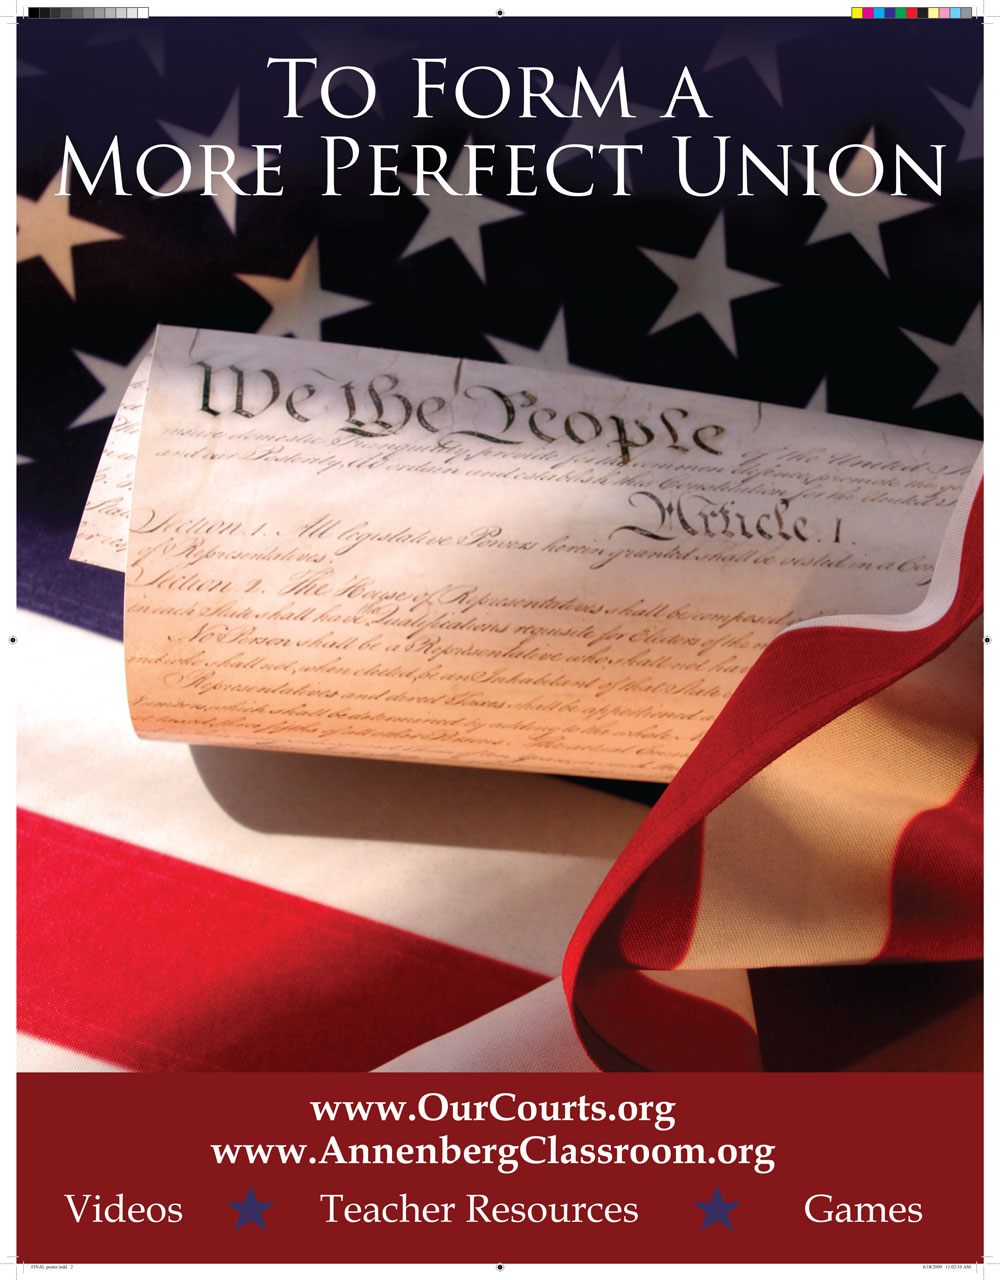 Poster, Annenberg Public Policy Center, University of Pensylvania